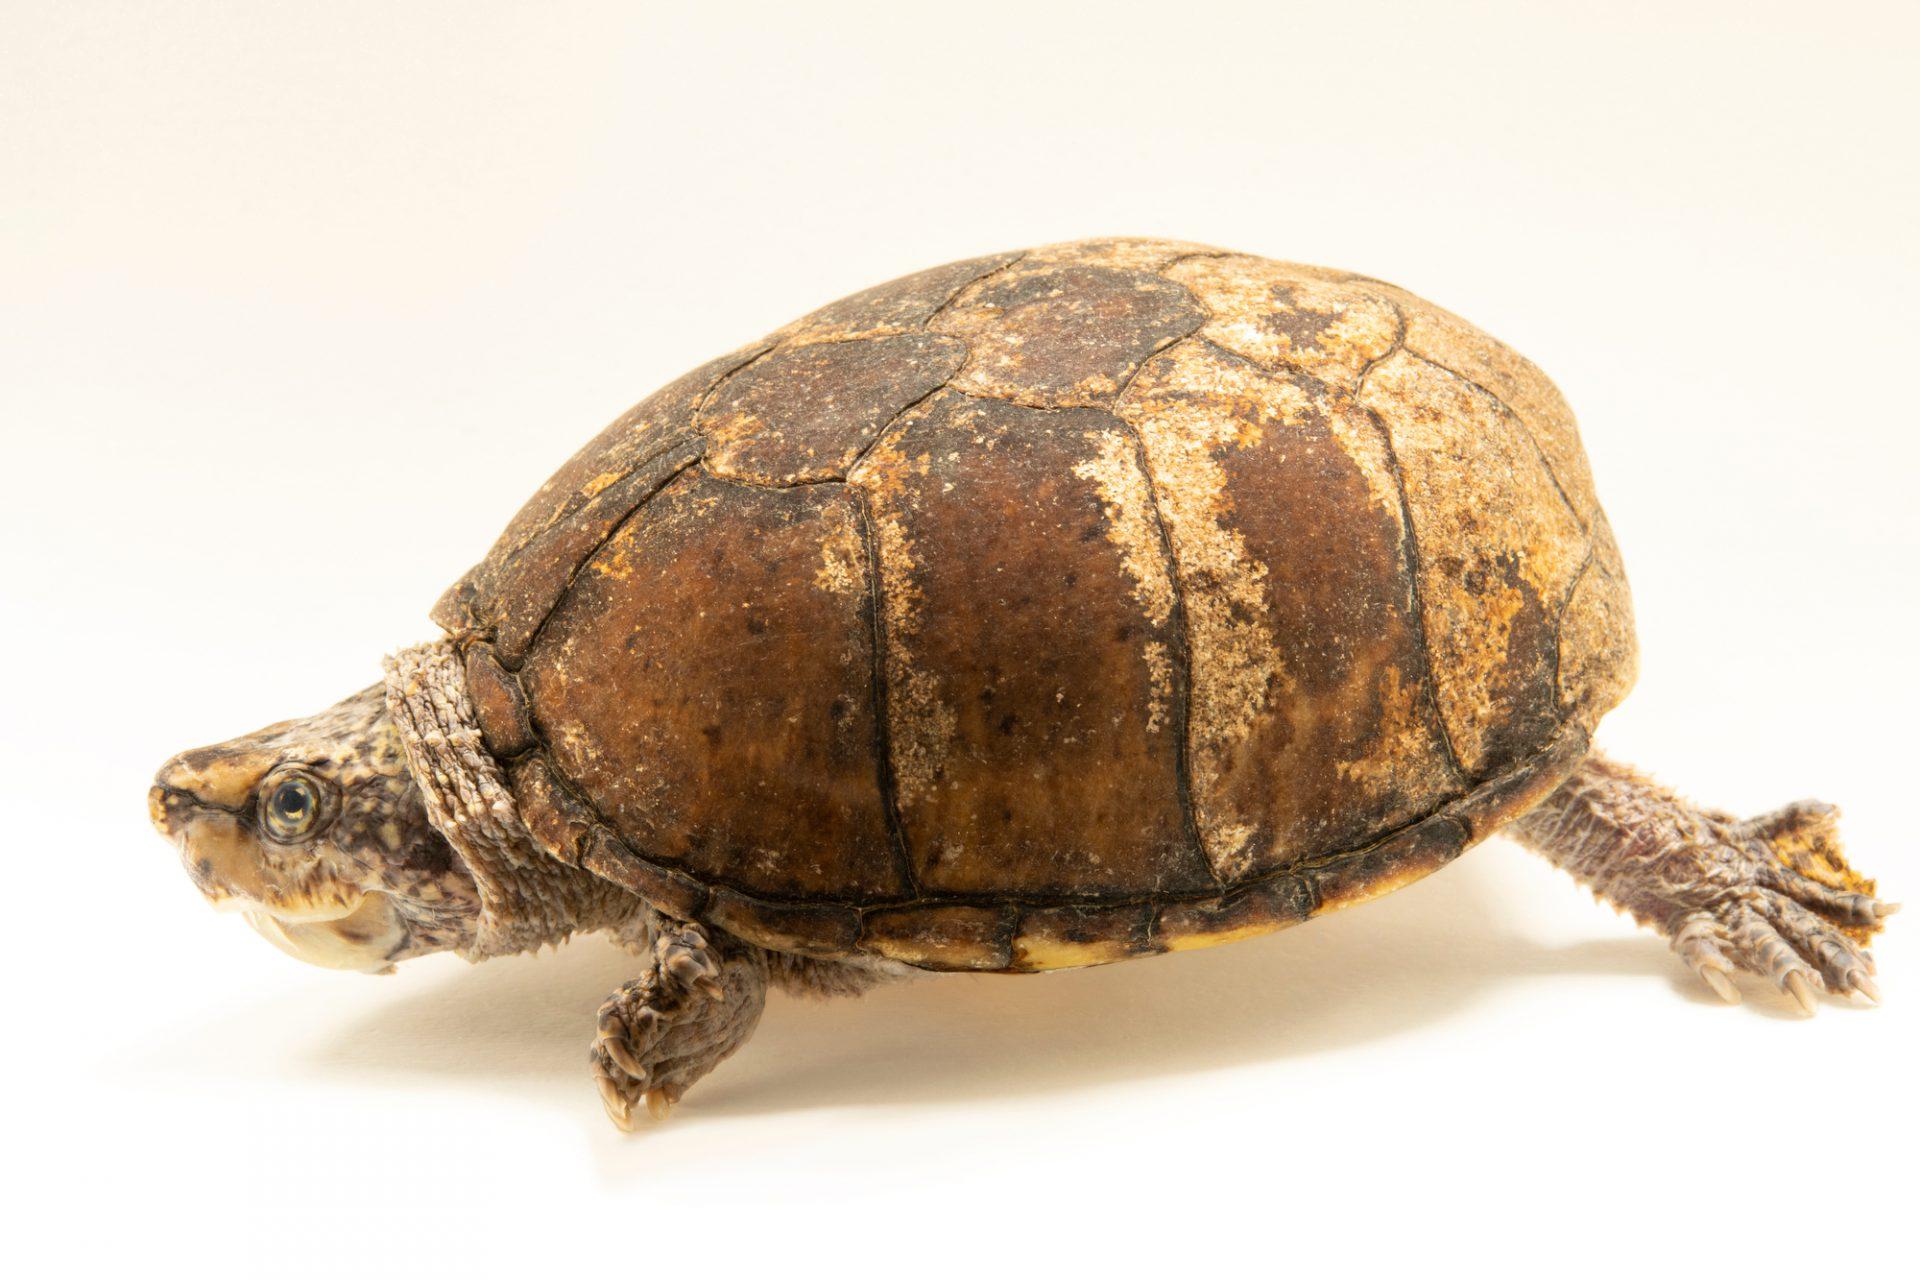 Photo: An Intermediate musk turtle (Sternotherus intermedius) at the Auburn University Natural History Museum.